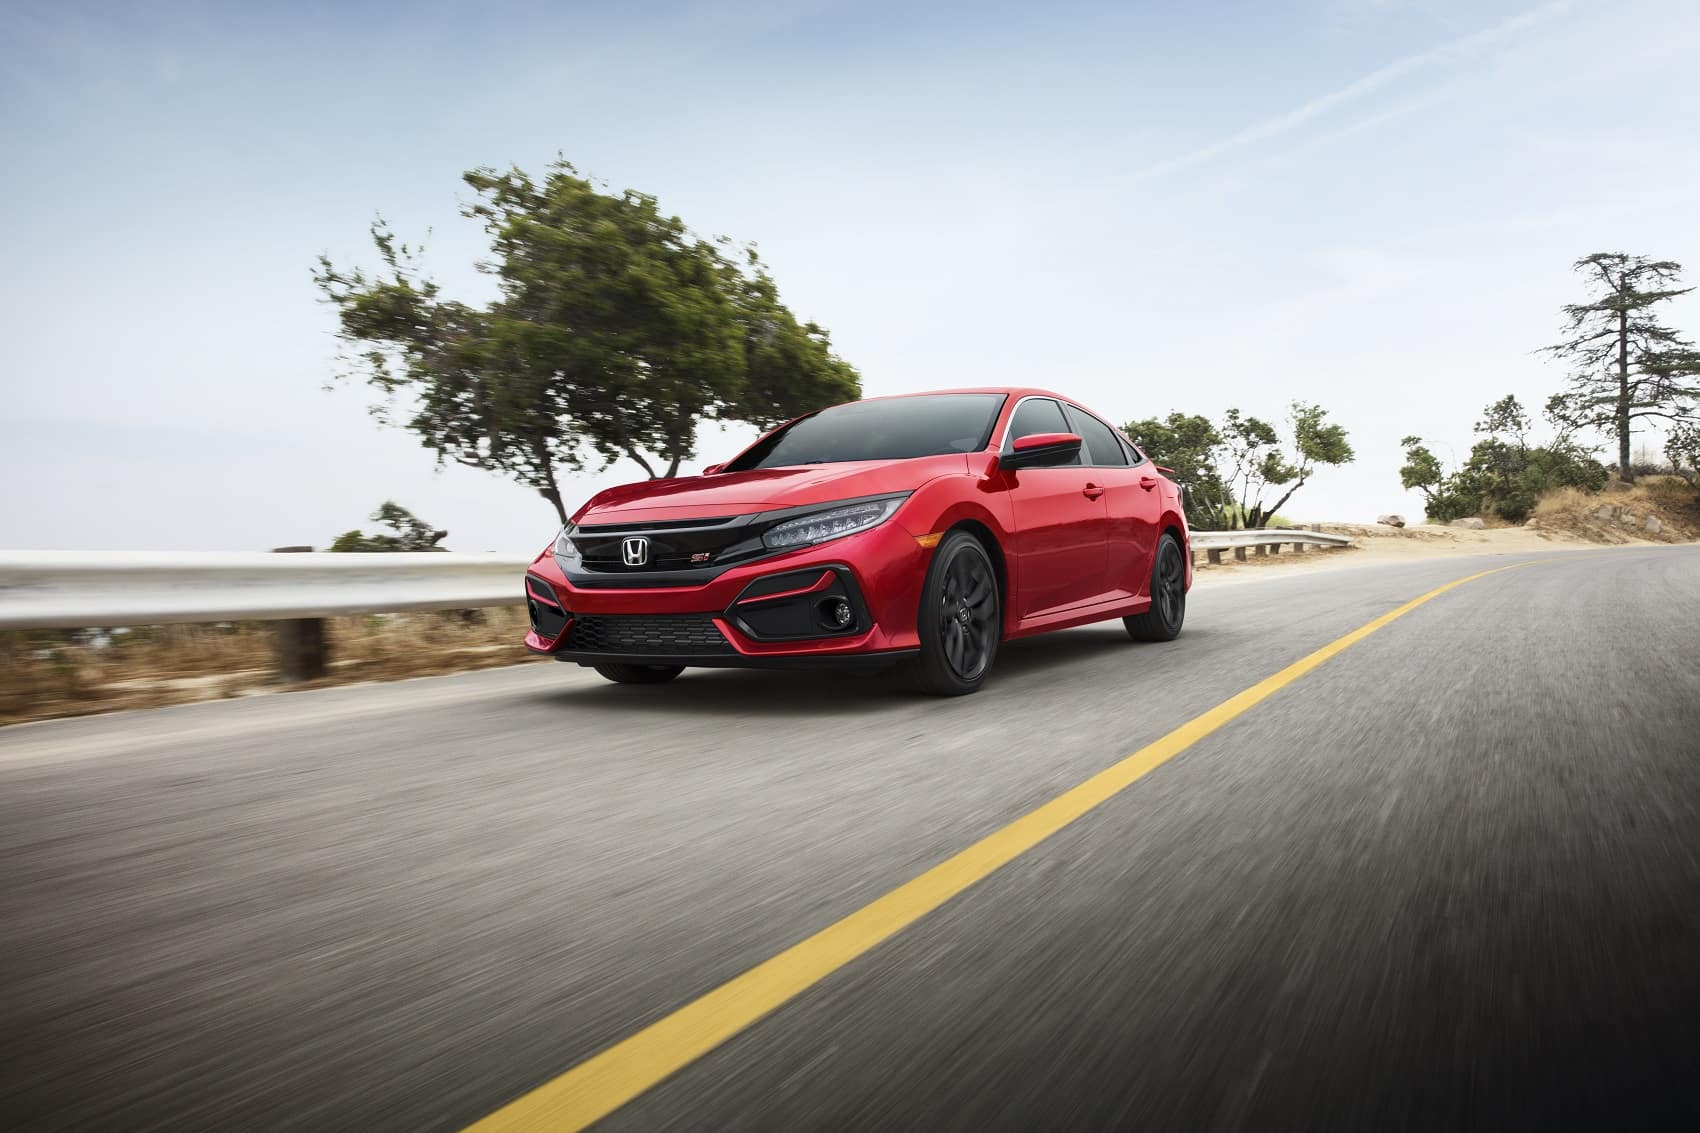 2020 Honda Civic Red